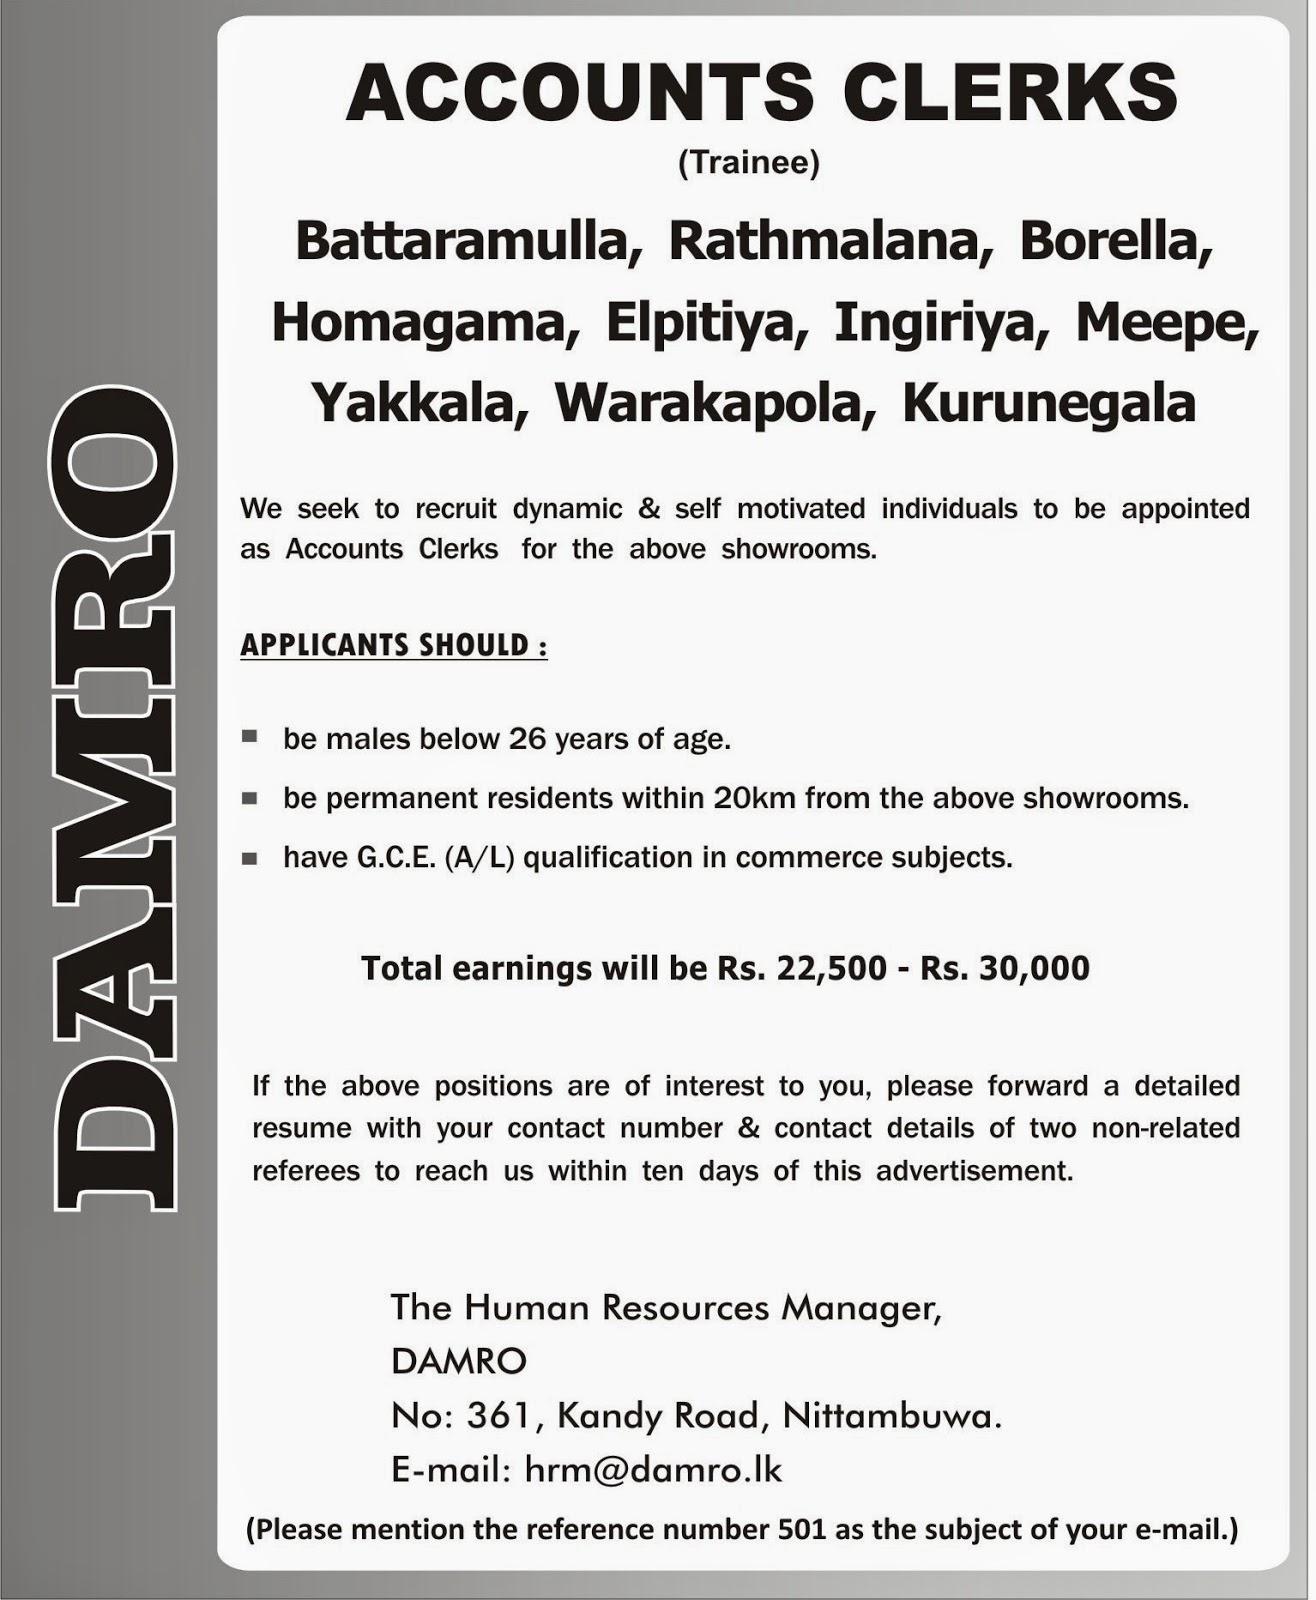 Pe Exam Results >> Accounts Clerks - Sri Lanka Vacancies - Top Rated Jobs Vacancies in Sri Lanka (adsbygoogle ...